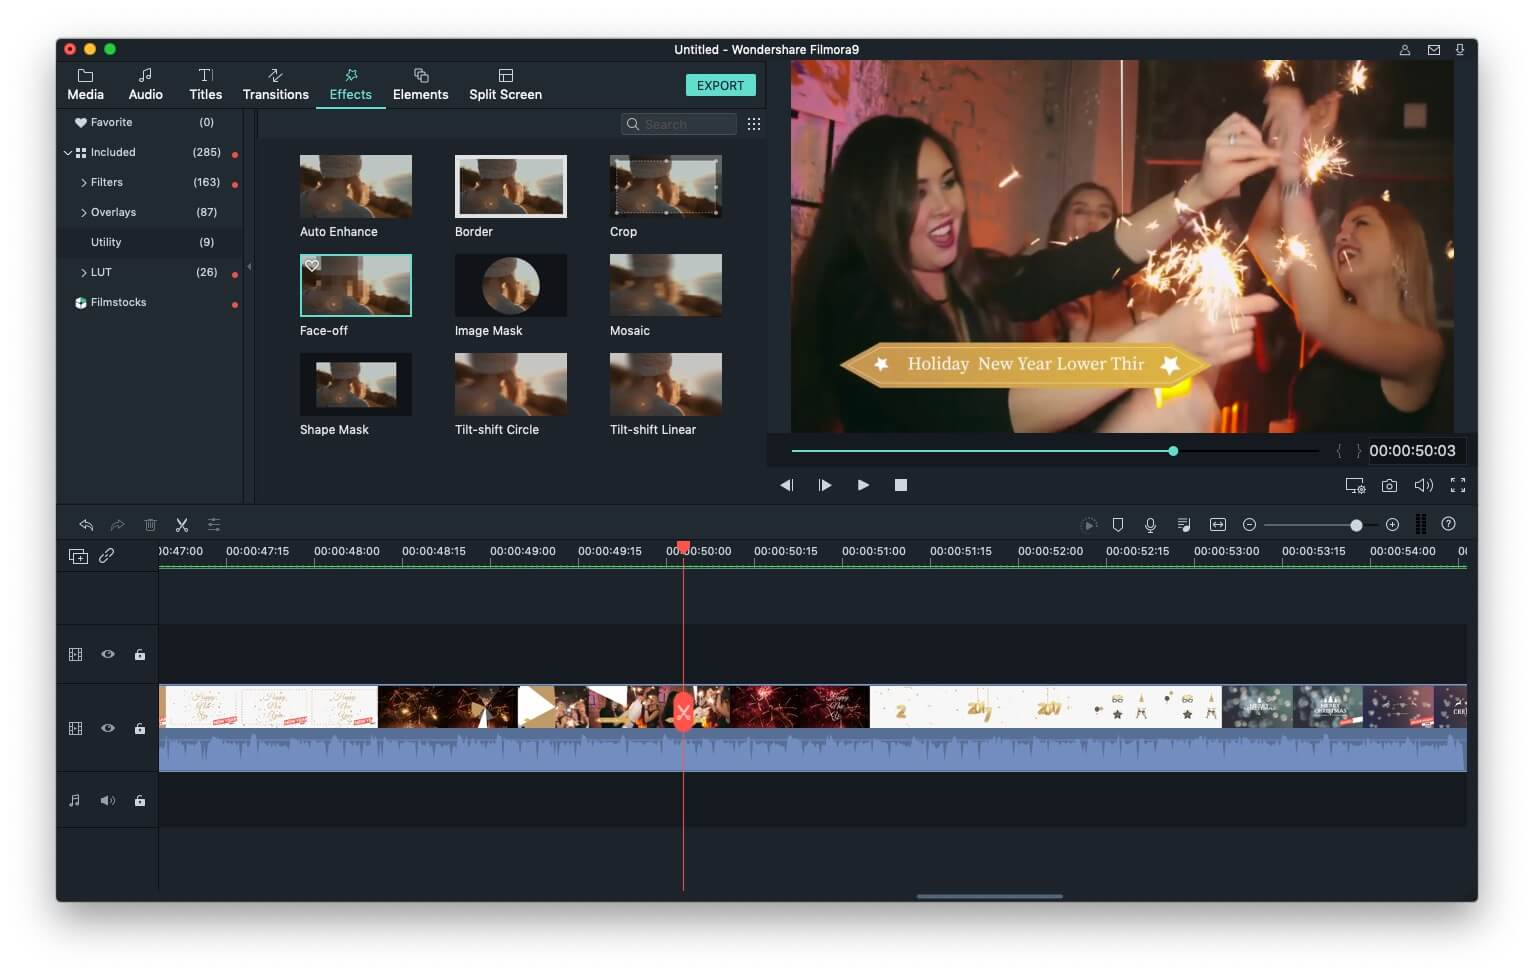 Filmora9 for Mac Face-off effect